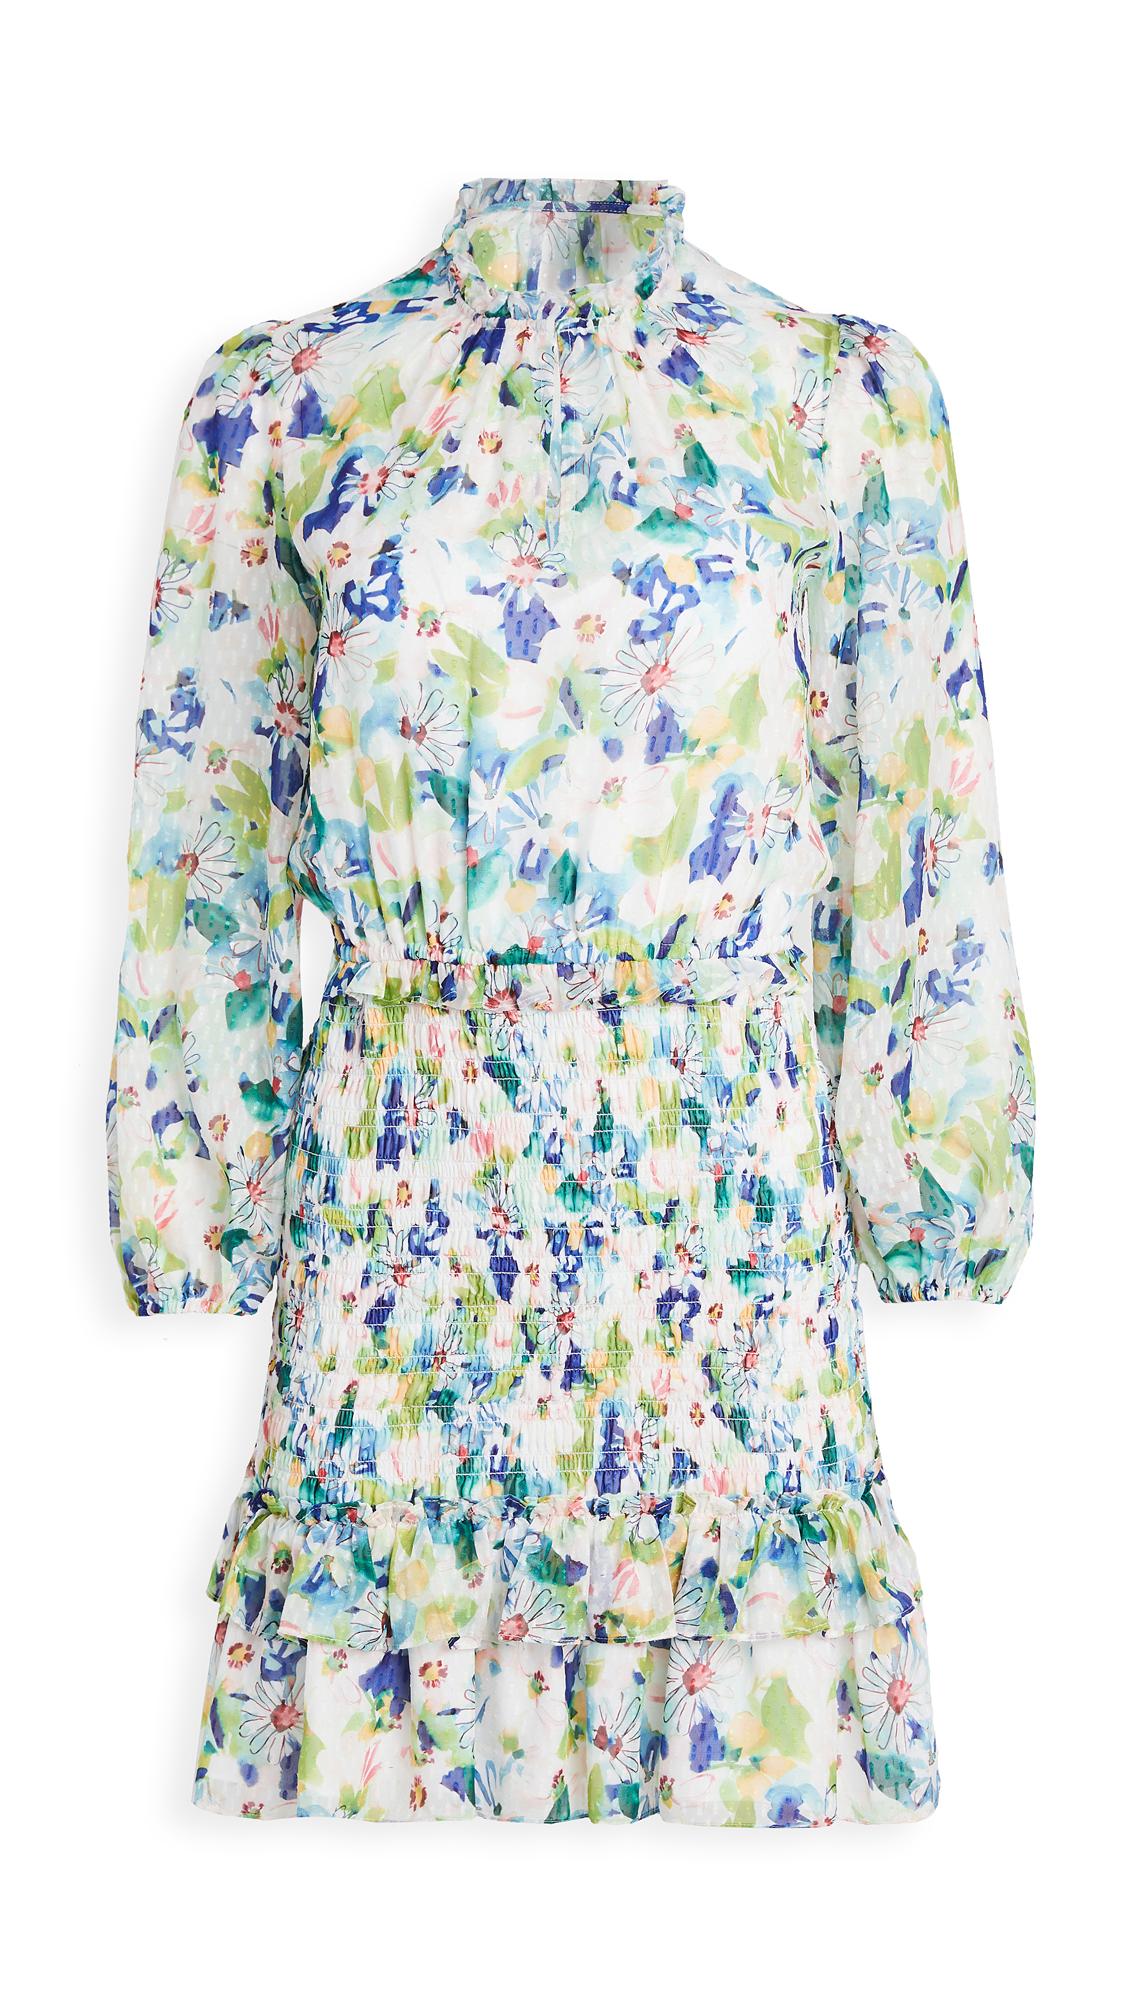 Shoshanna Serafina Dress - 30% Off Sale